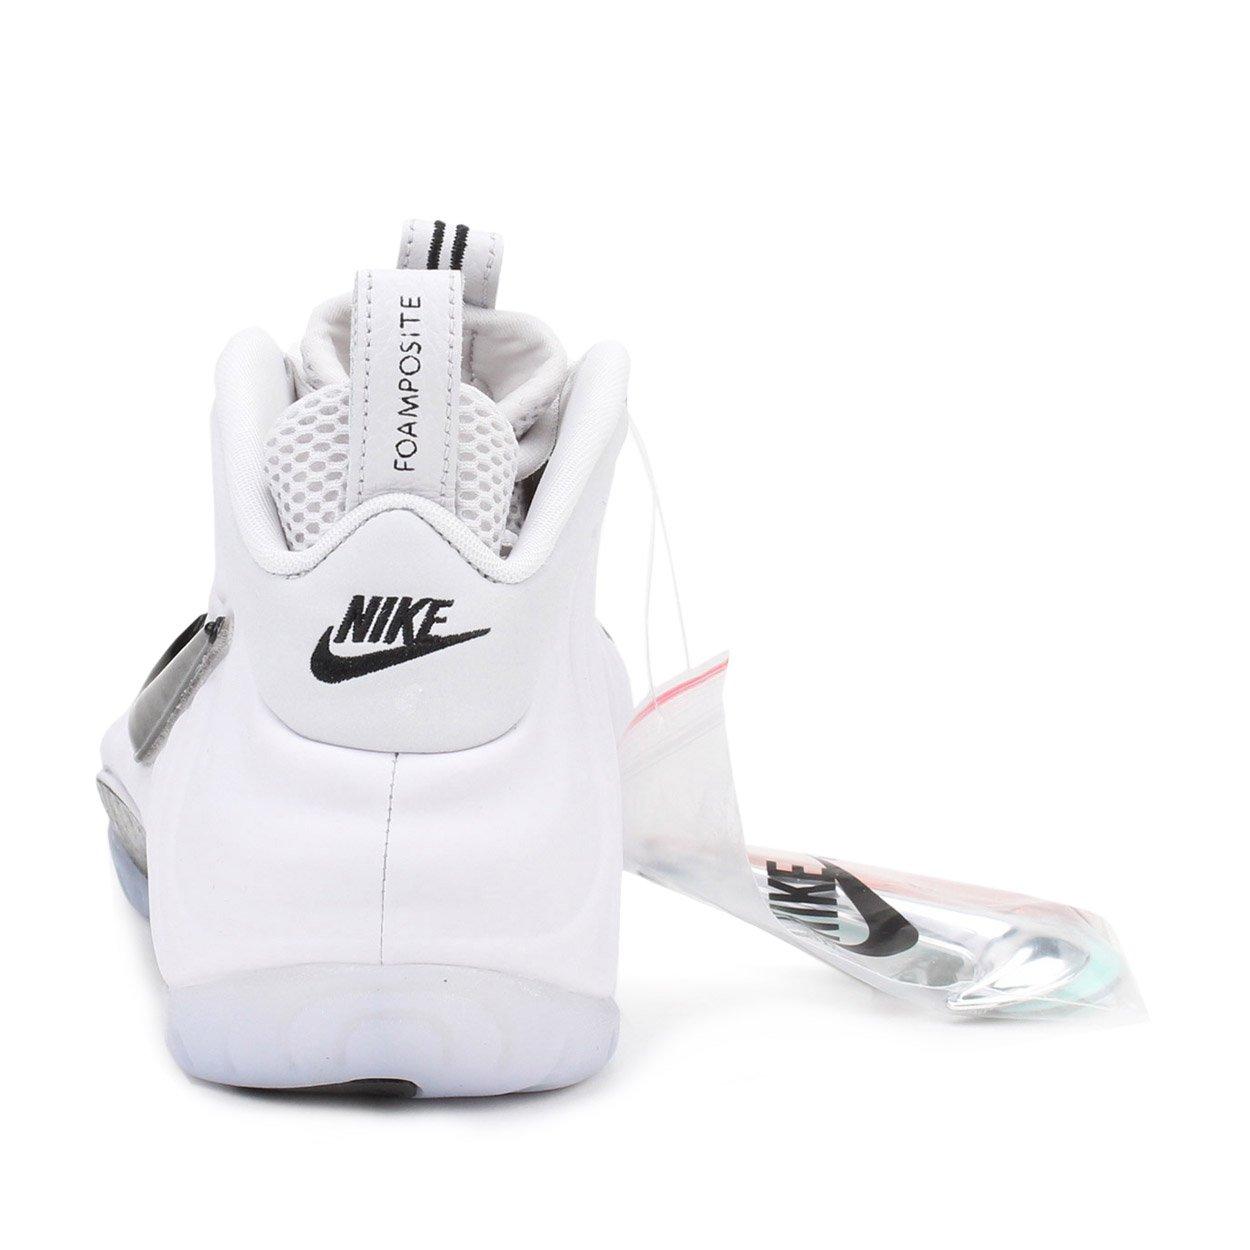 adidas supercolor kaki, Chaussure Adidas Samba Sport Homme